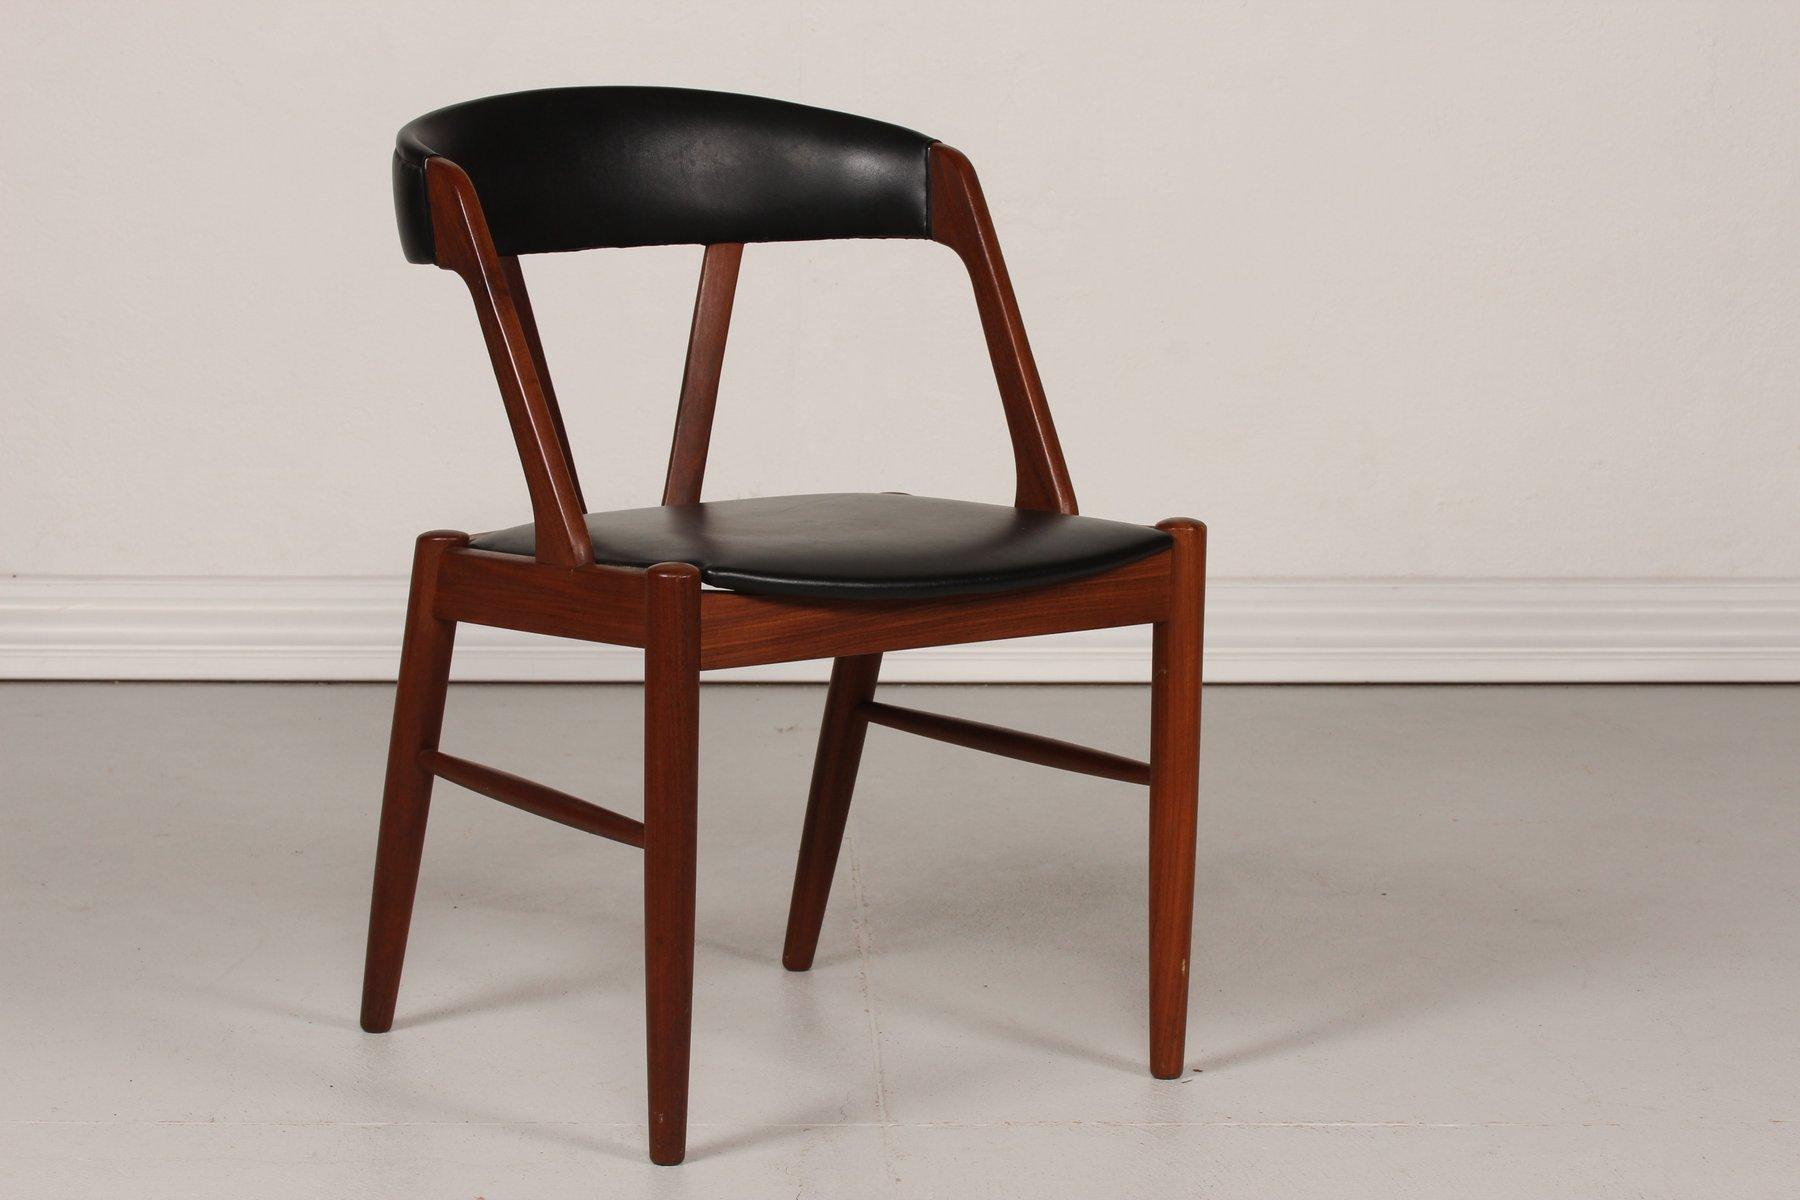 Danish Desk Chair In Teak With Black Skai Seat 1960s